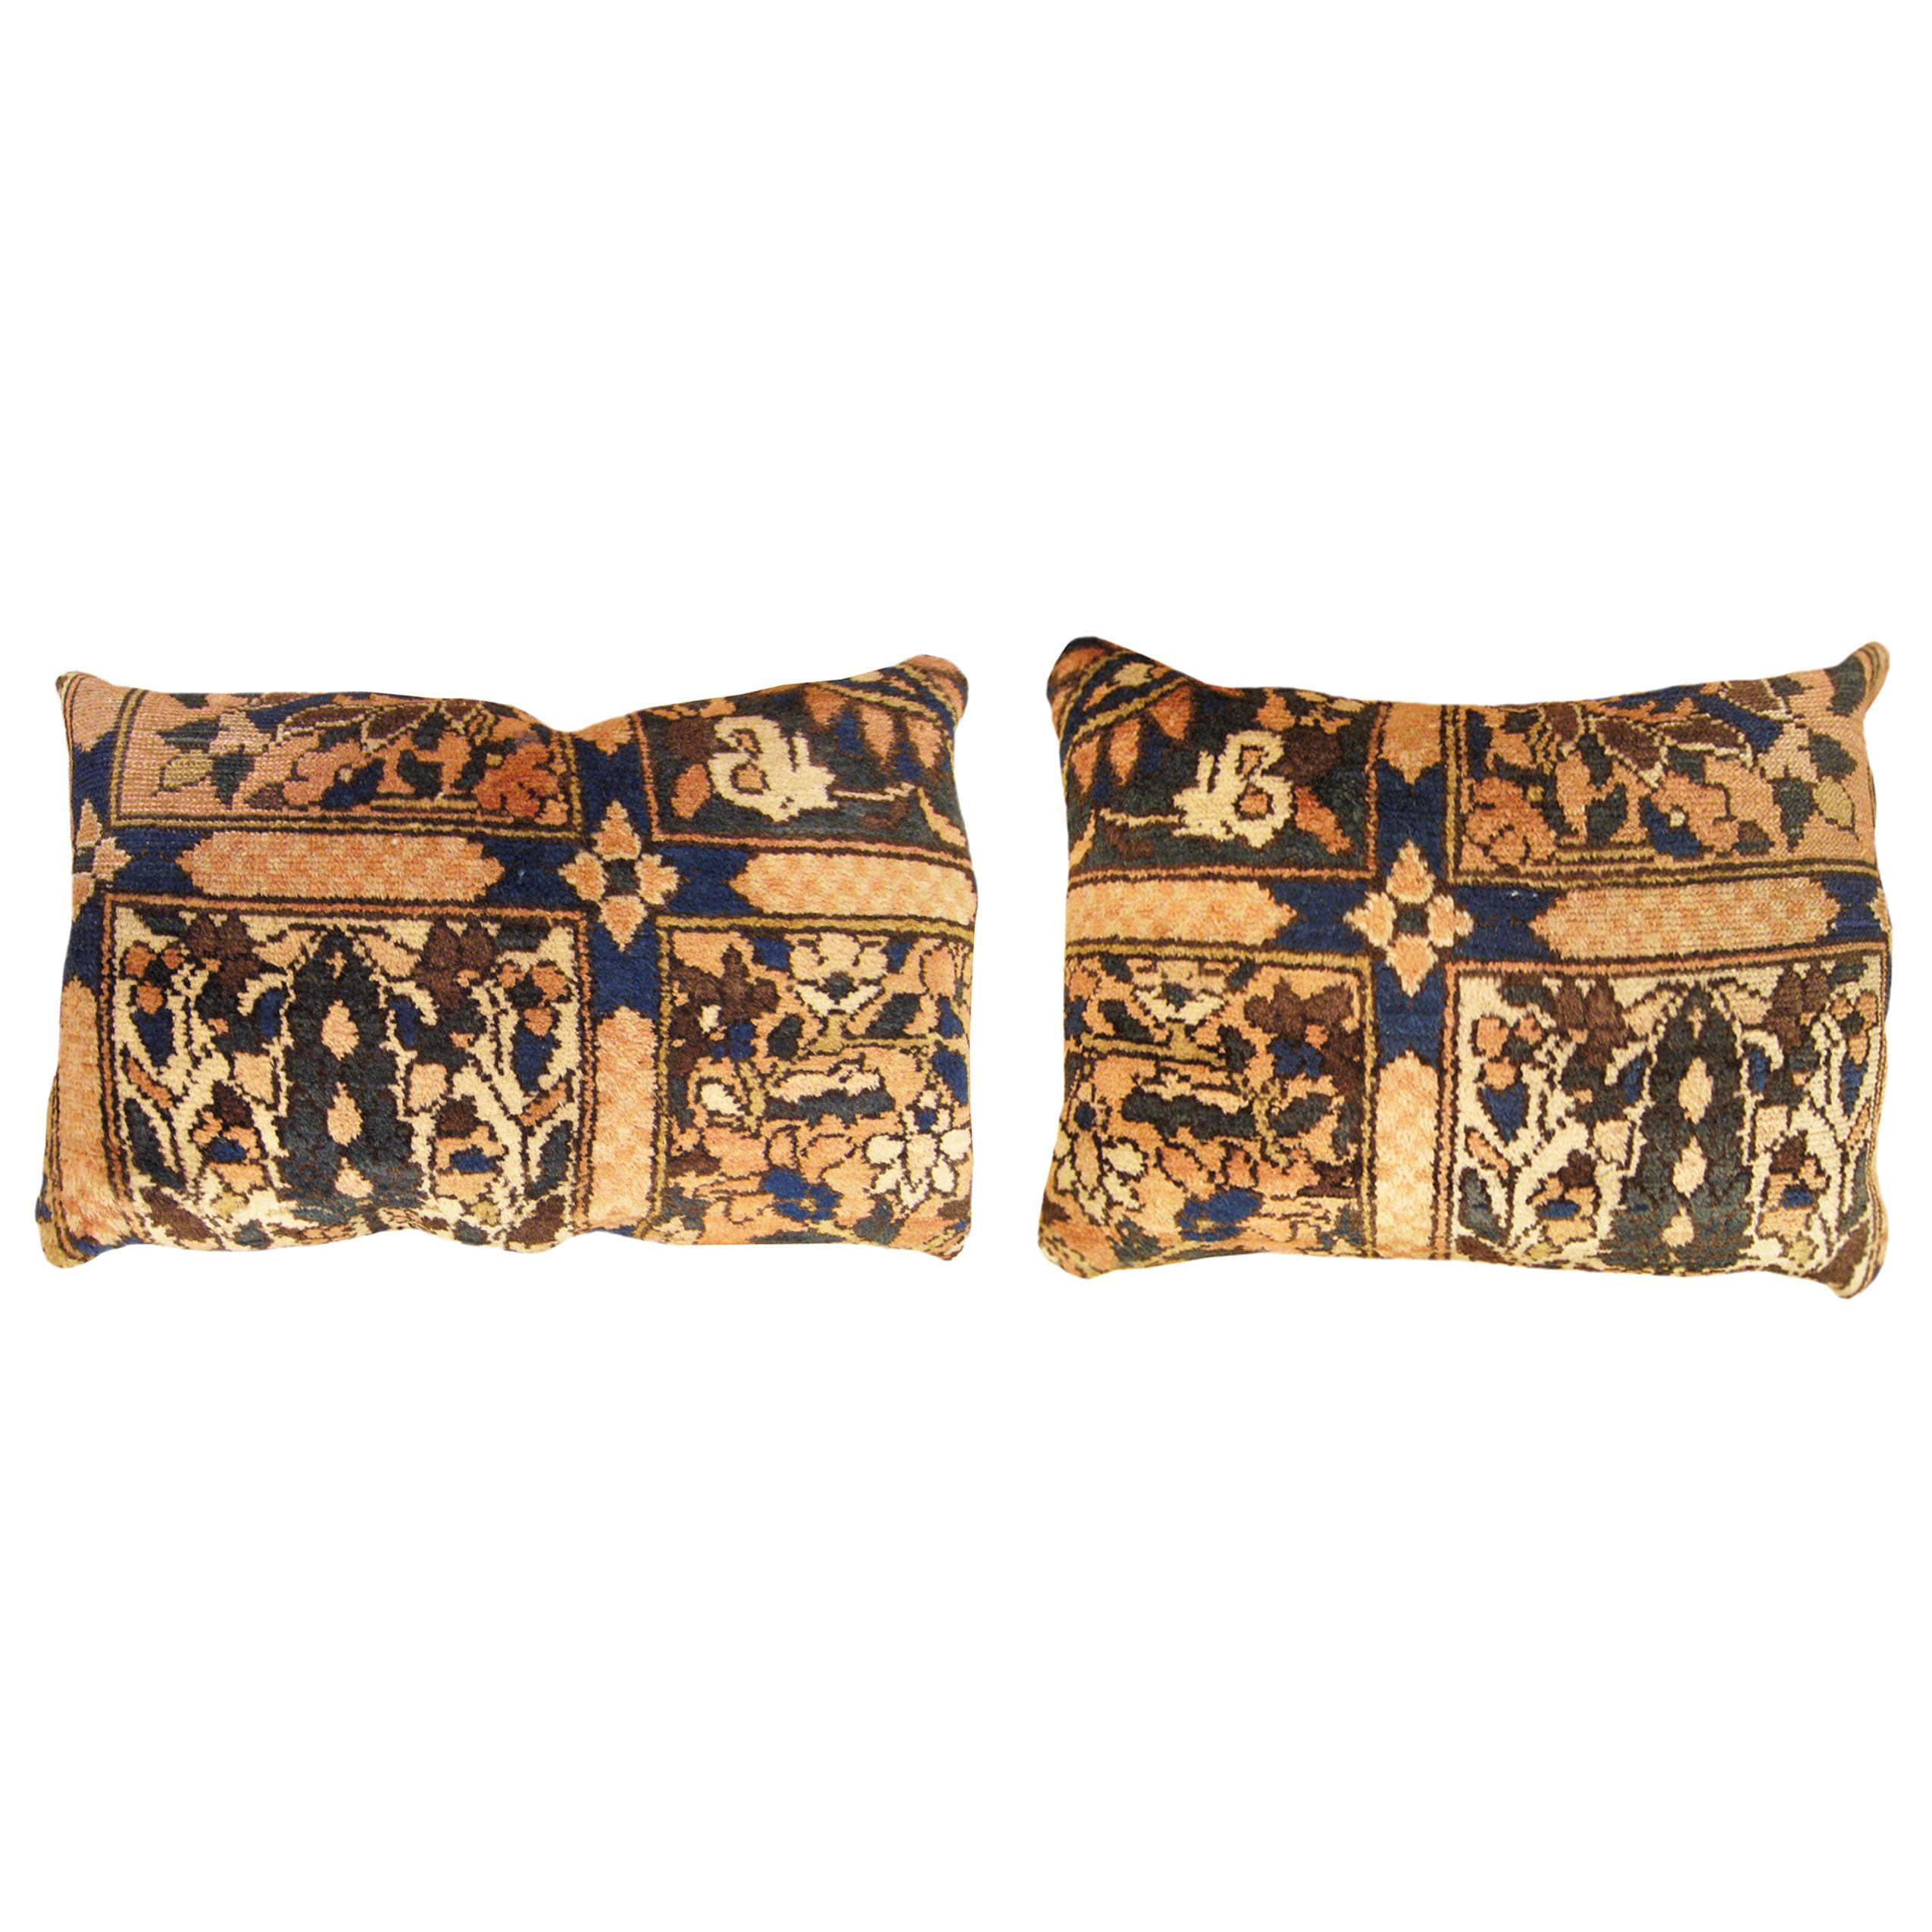 Pair of Vintage Persian Baktiari Decorative Oriental Rug Pillows